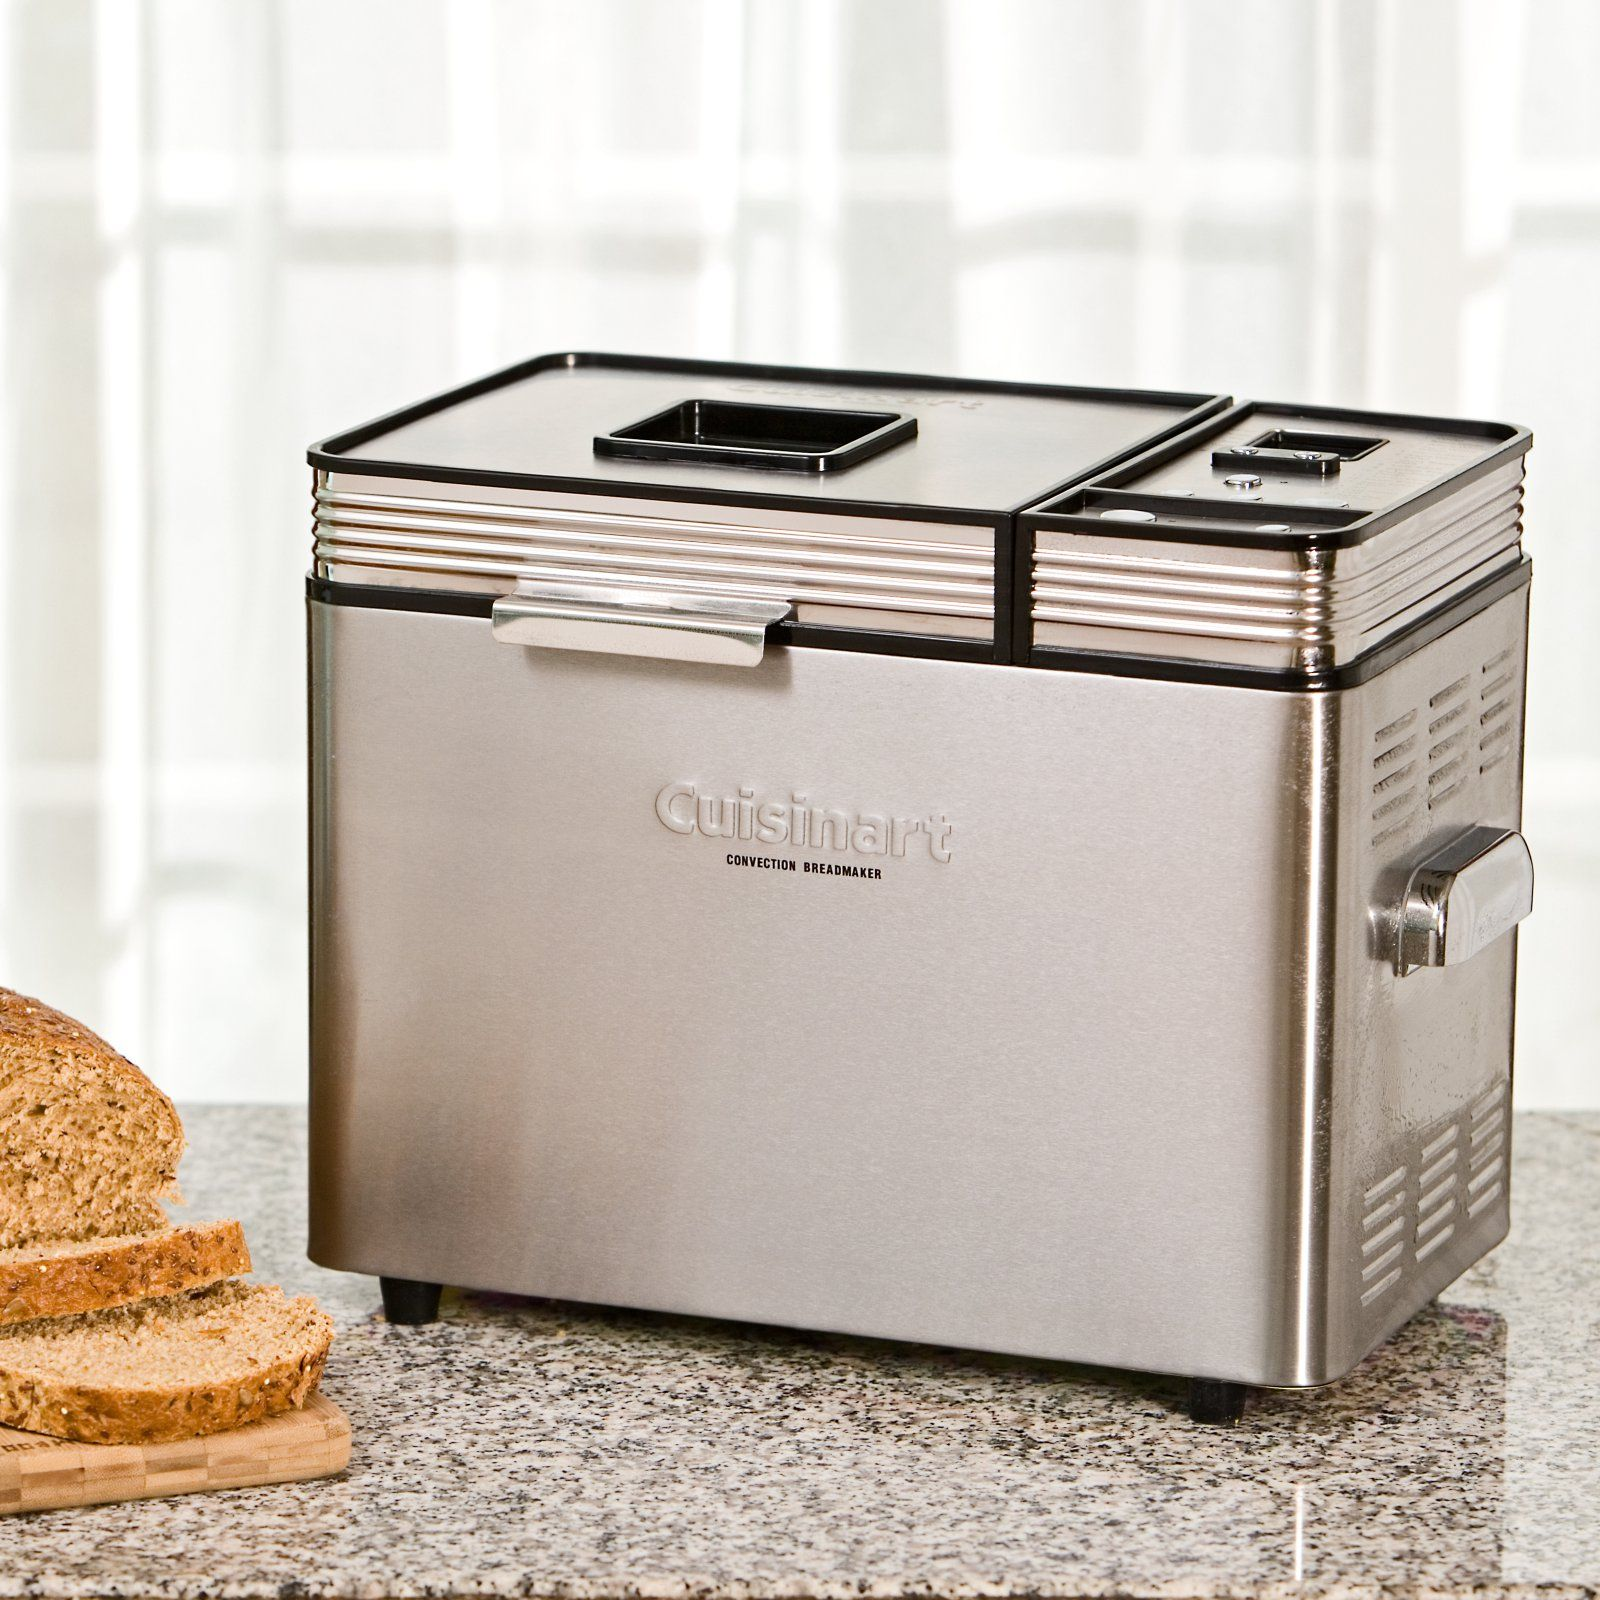 Cuisinart Cbk 200 2 Lb Convection Bread Maker Bread Maker Cuisinart Cooking Kitchen